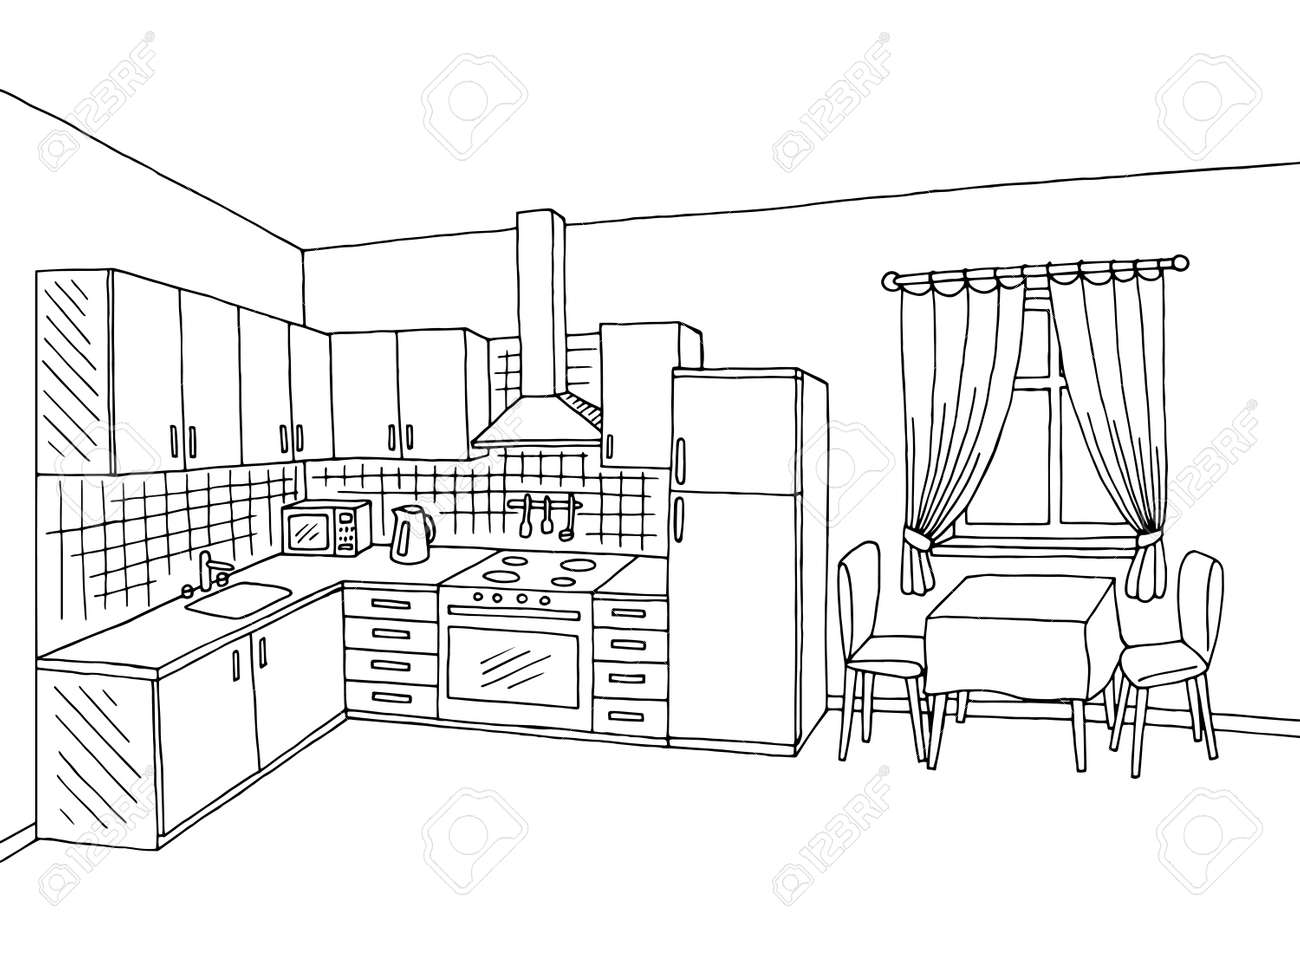 Kuche Room Interior Schwarz Weiss Grafik Design Skizze Abbildung